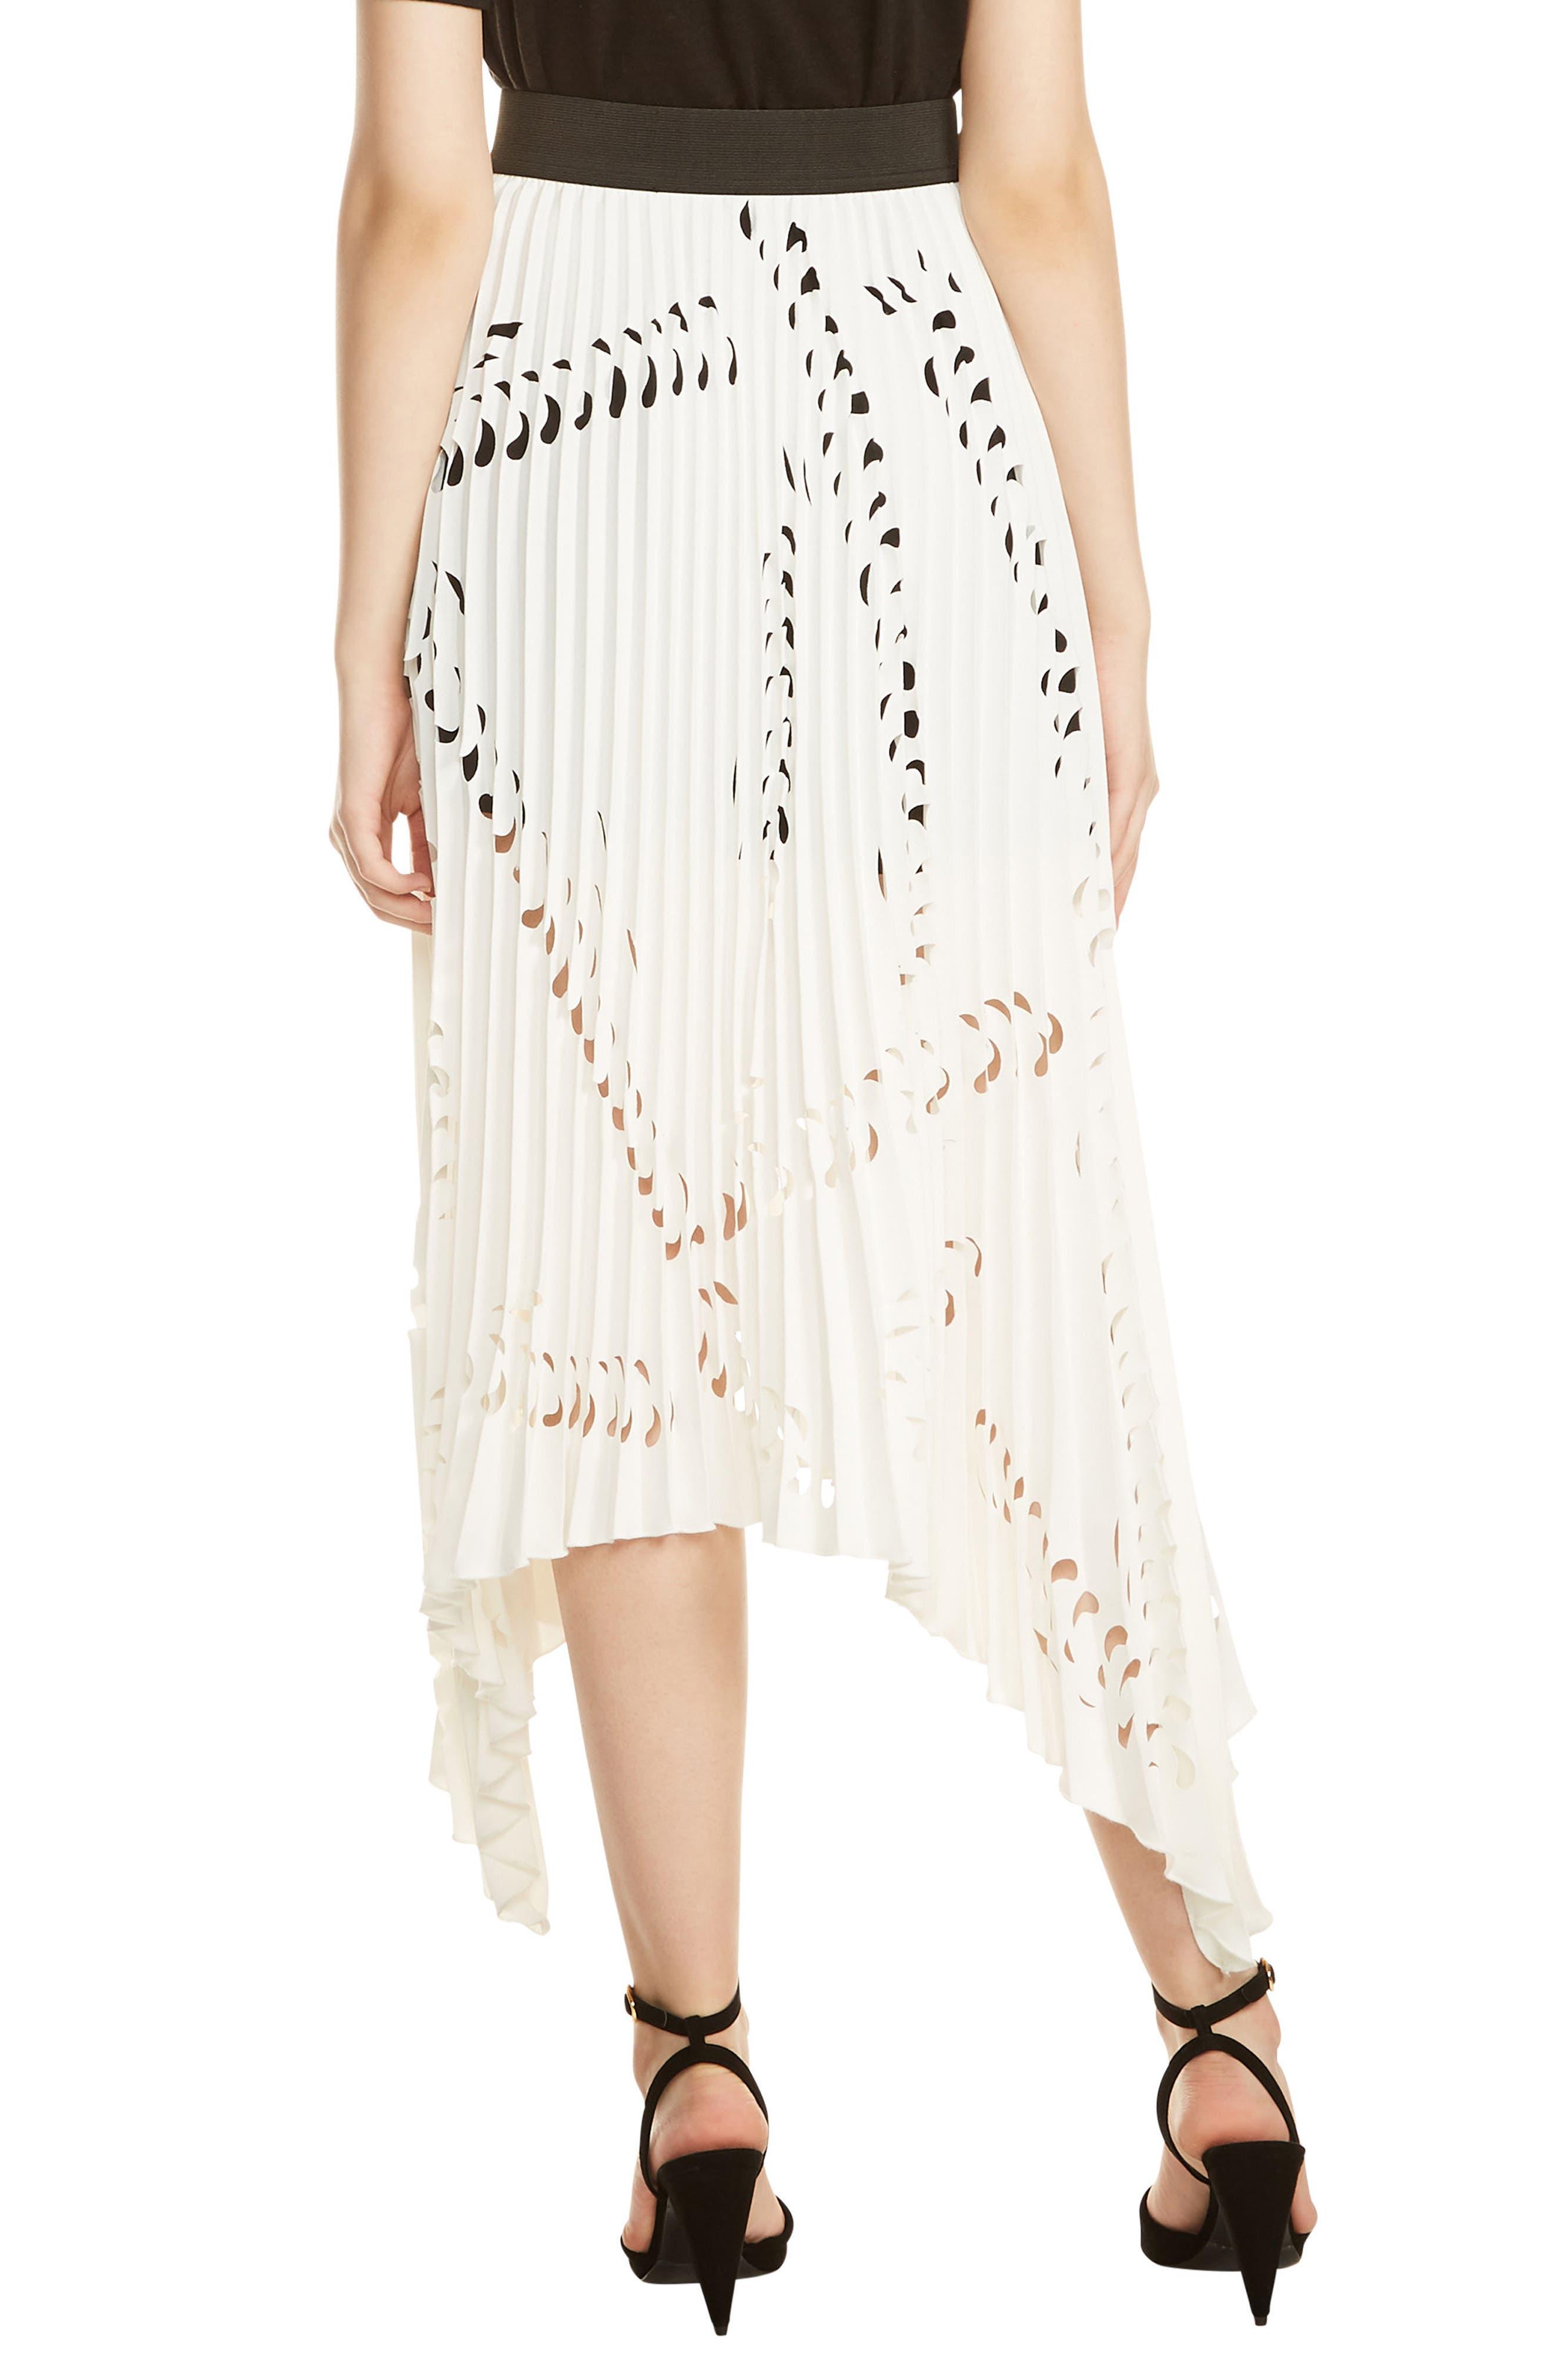 Jeflexe Cutout Pleat Midi Skirt,                             Alternate thumbnail 2, color,                             Blanc